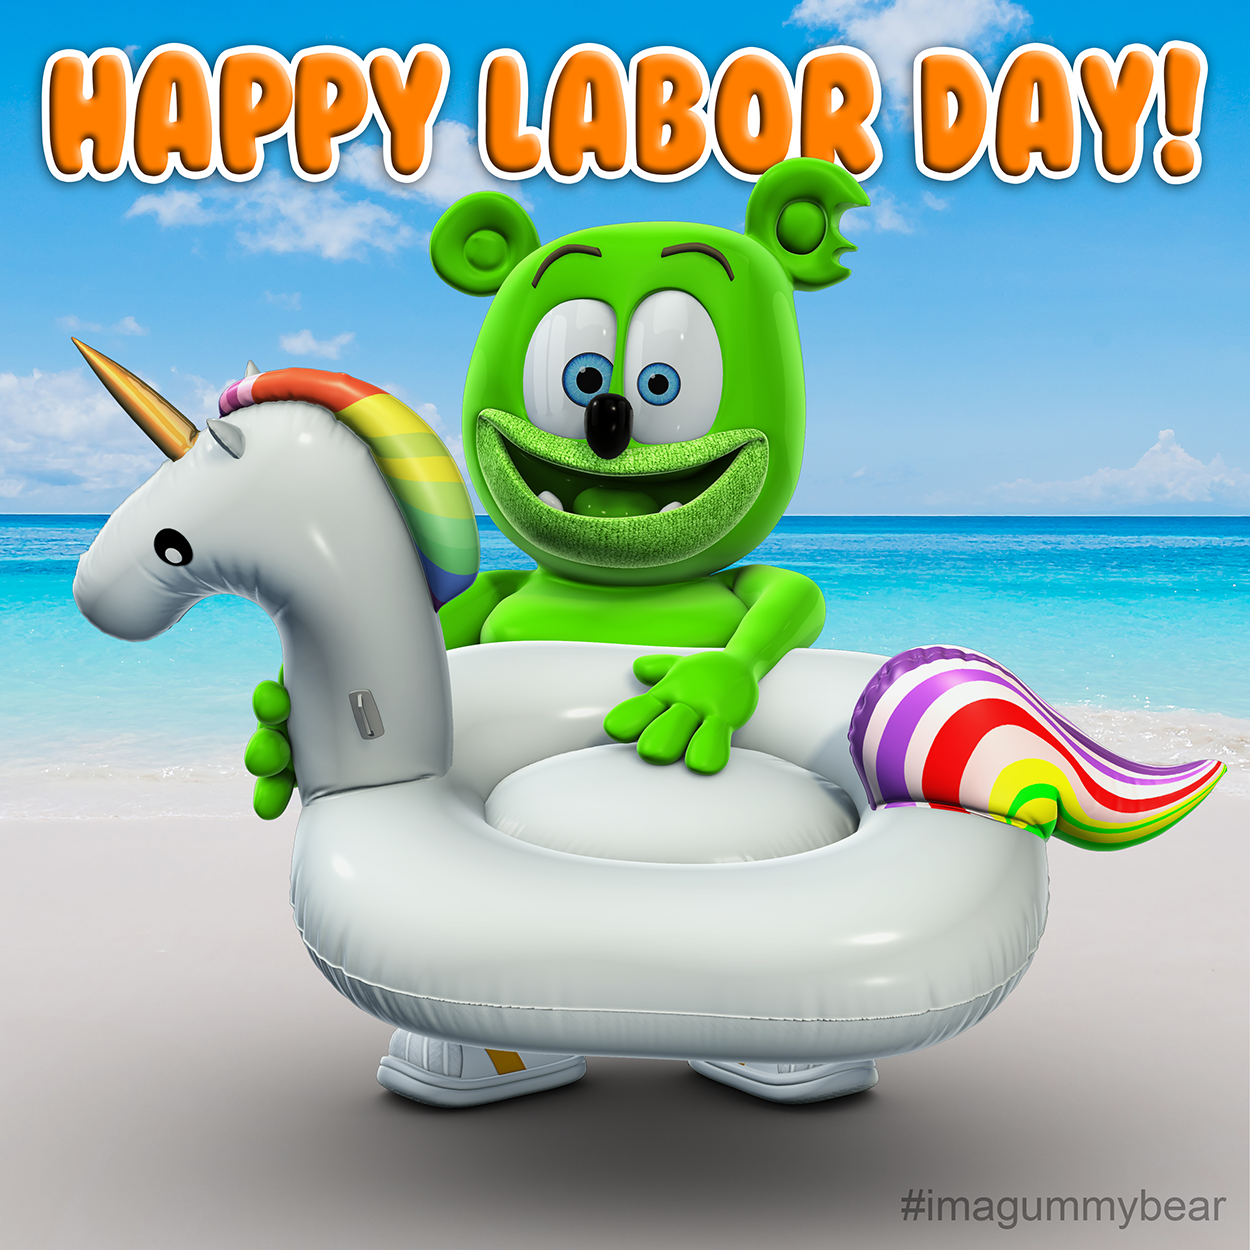 labor day 2018 gummy bear song gummibar i am a gummybear international nuki nuki unicorn tube beach summer 2018 youtube youtuber kids music childrens cartoon